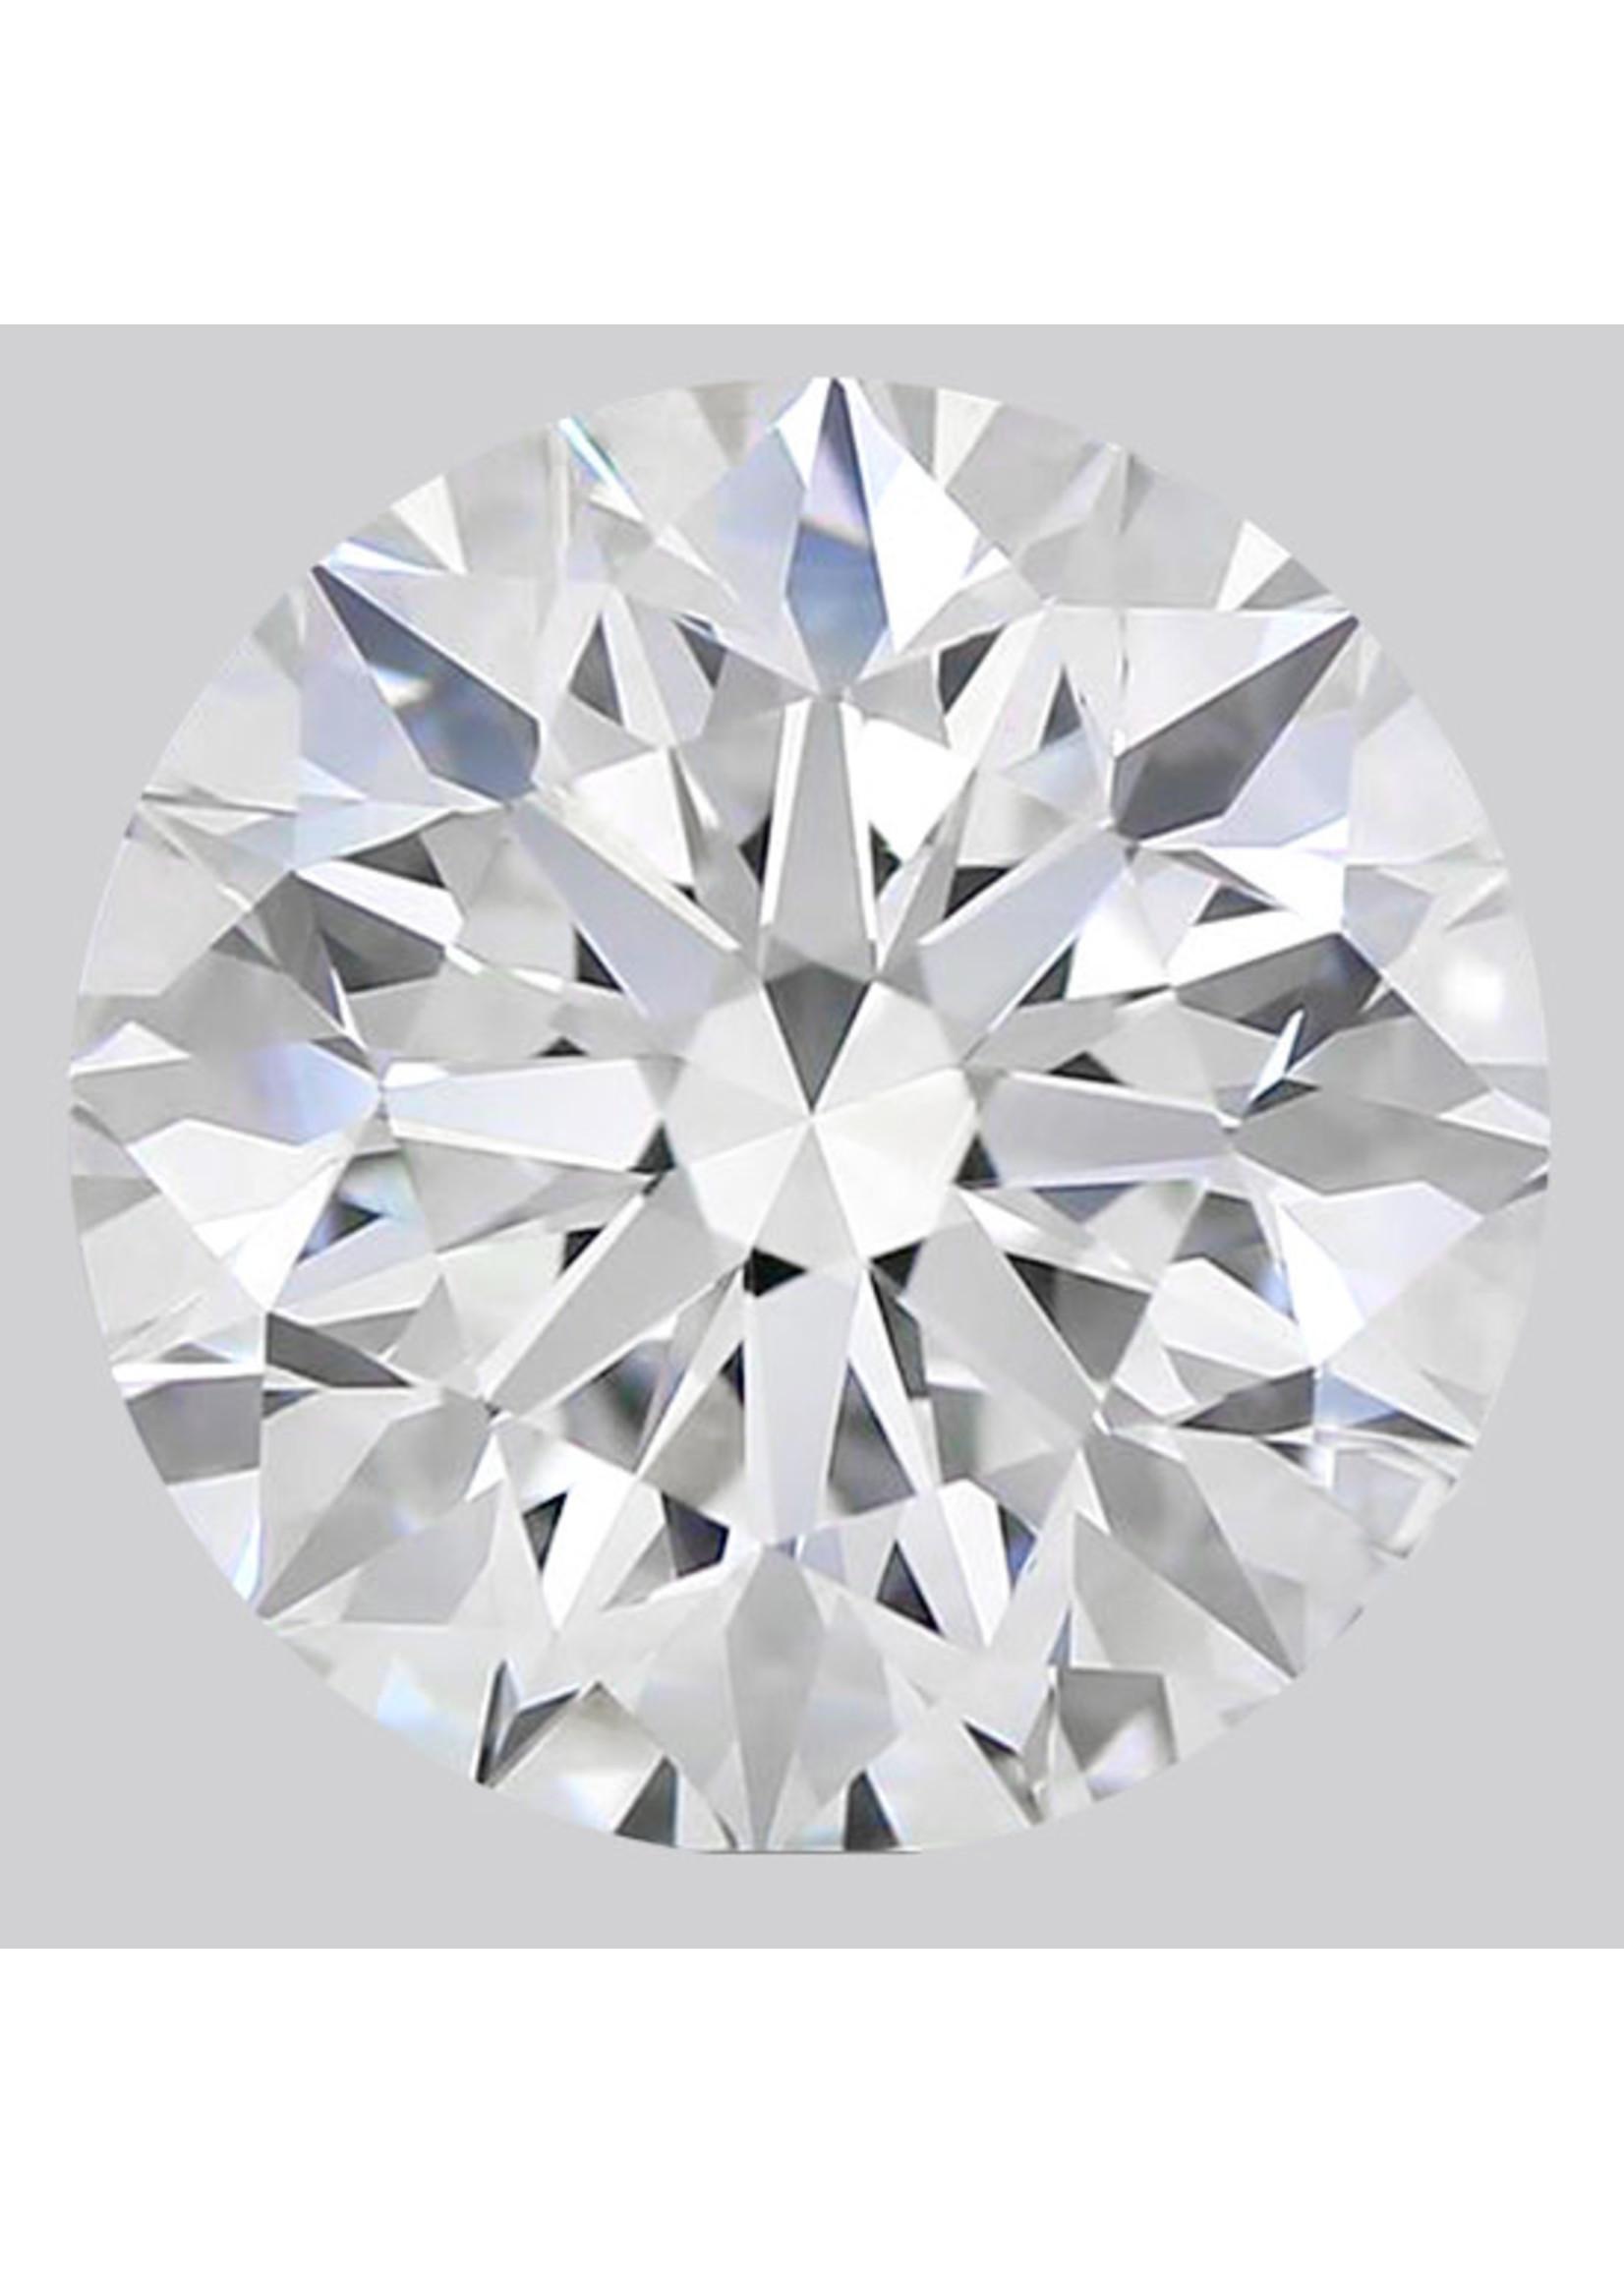 Diamond ROUND CUT DIAMOND 1.56 CT. Affinity Cut | K Color | SI1 Clarity